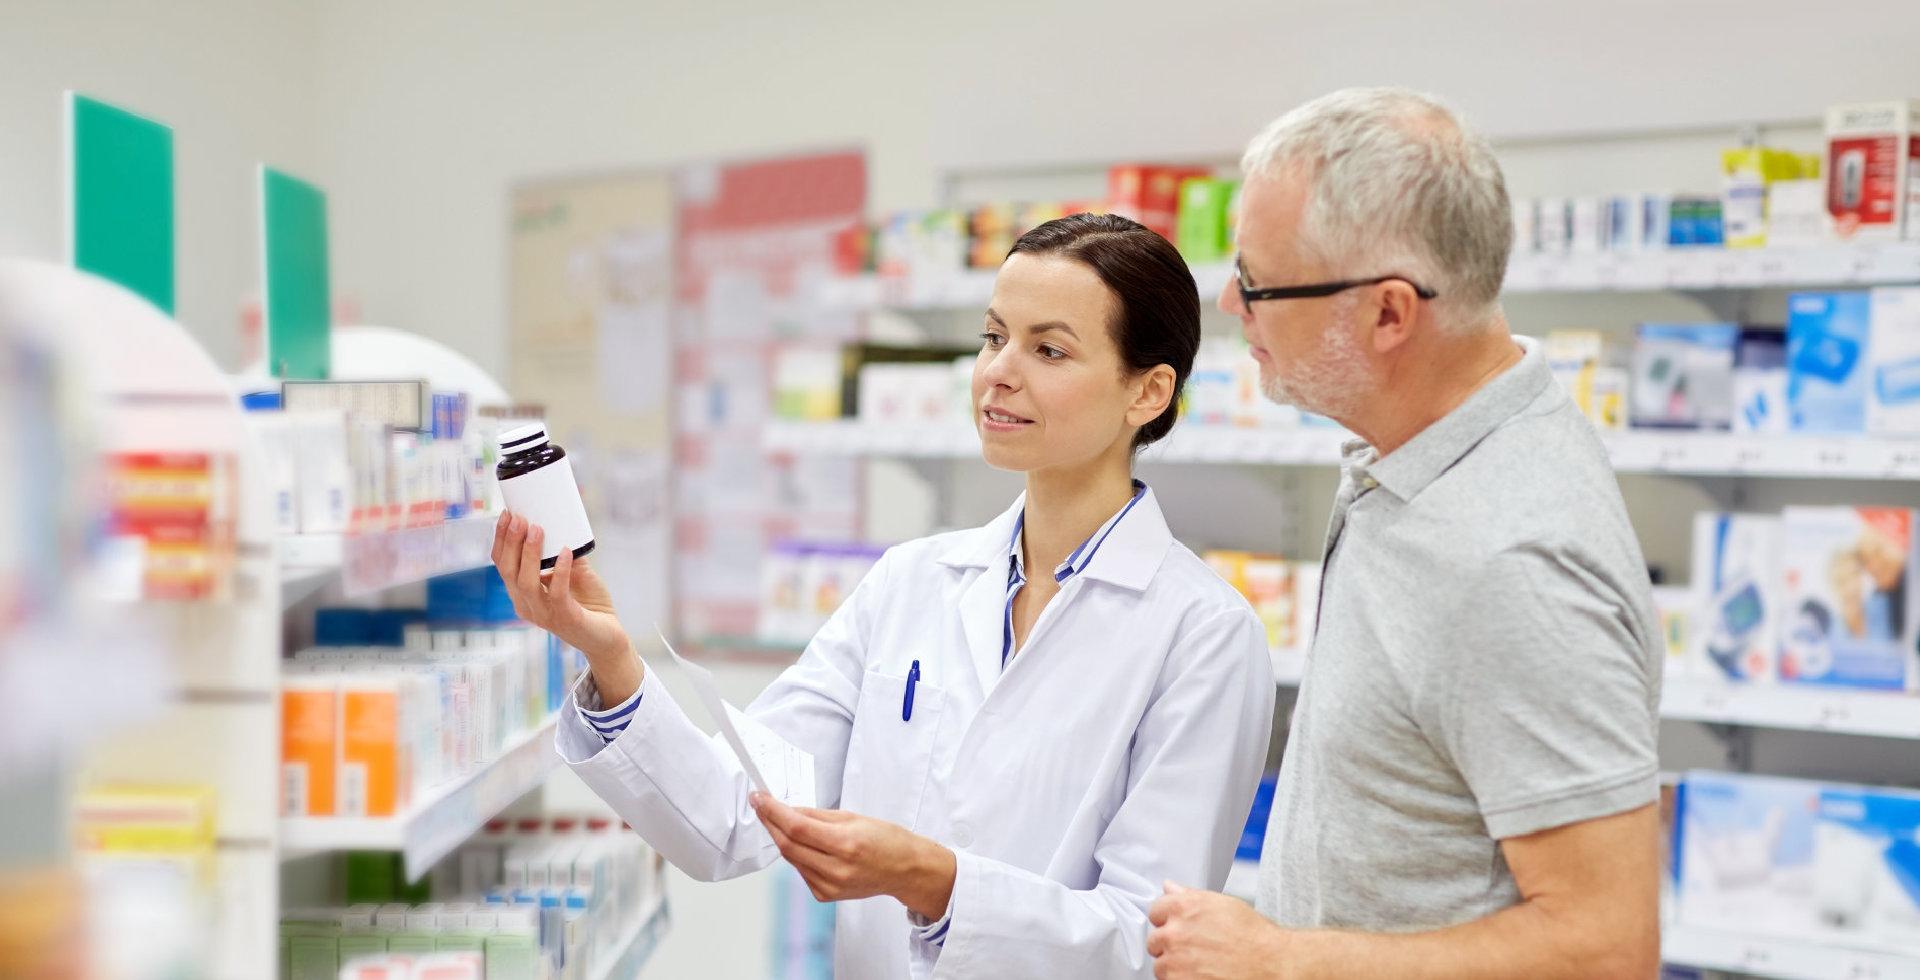 pharmacist explaining the product to the customer